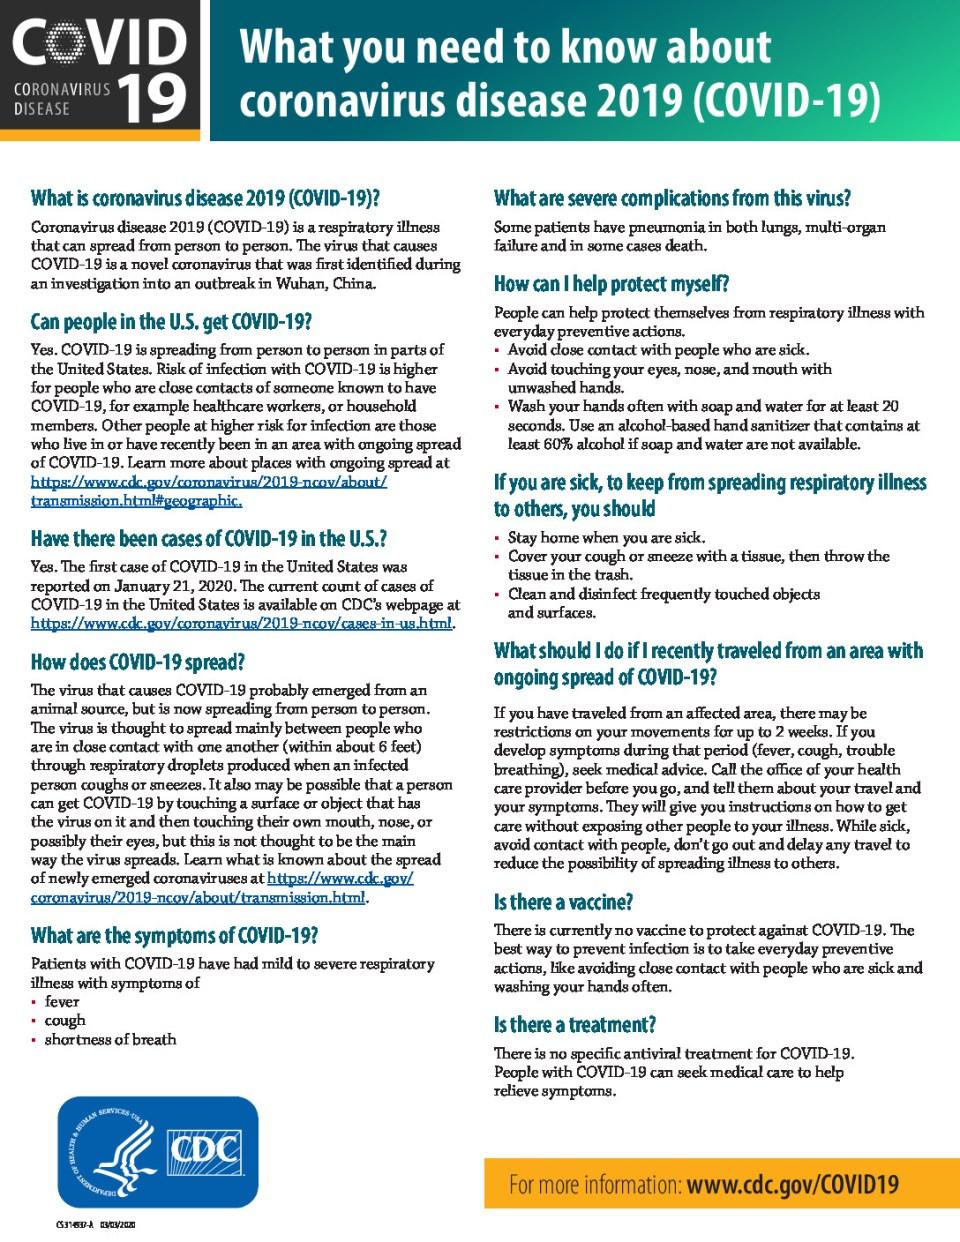 COVID-19 Public Health Resources - Convergint